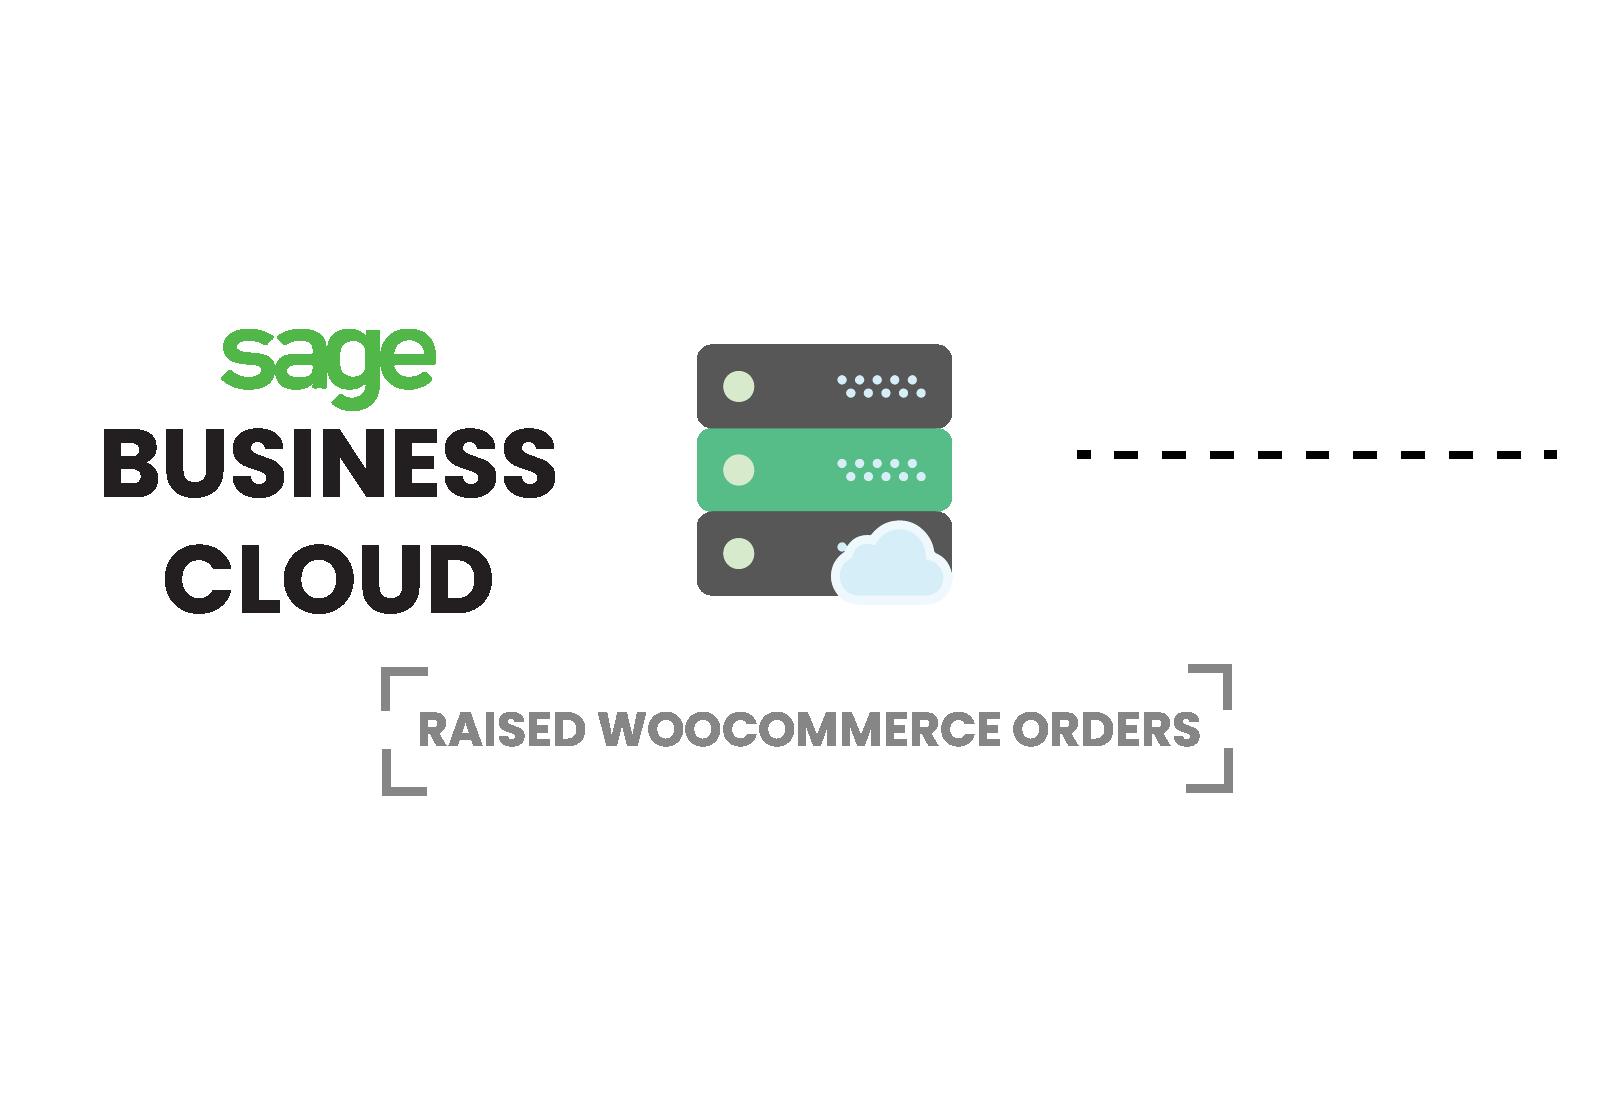 Sage Business Cloud WooCommerce Integration - Sage WooCommerce